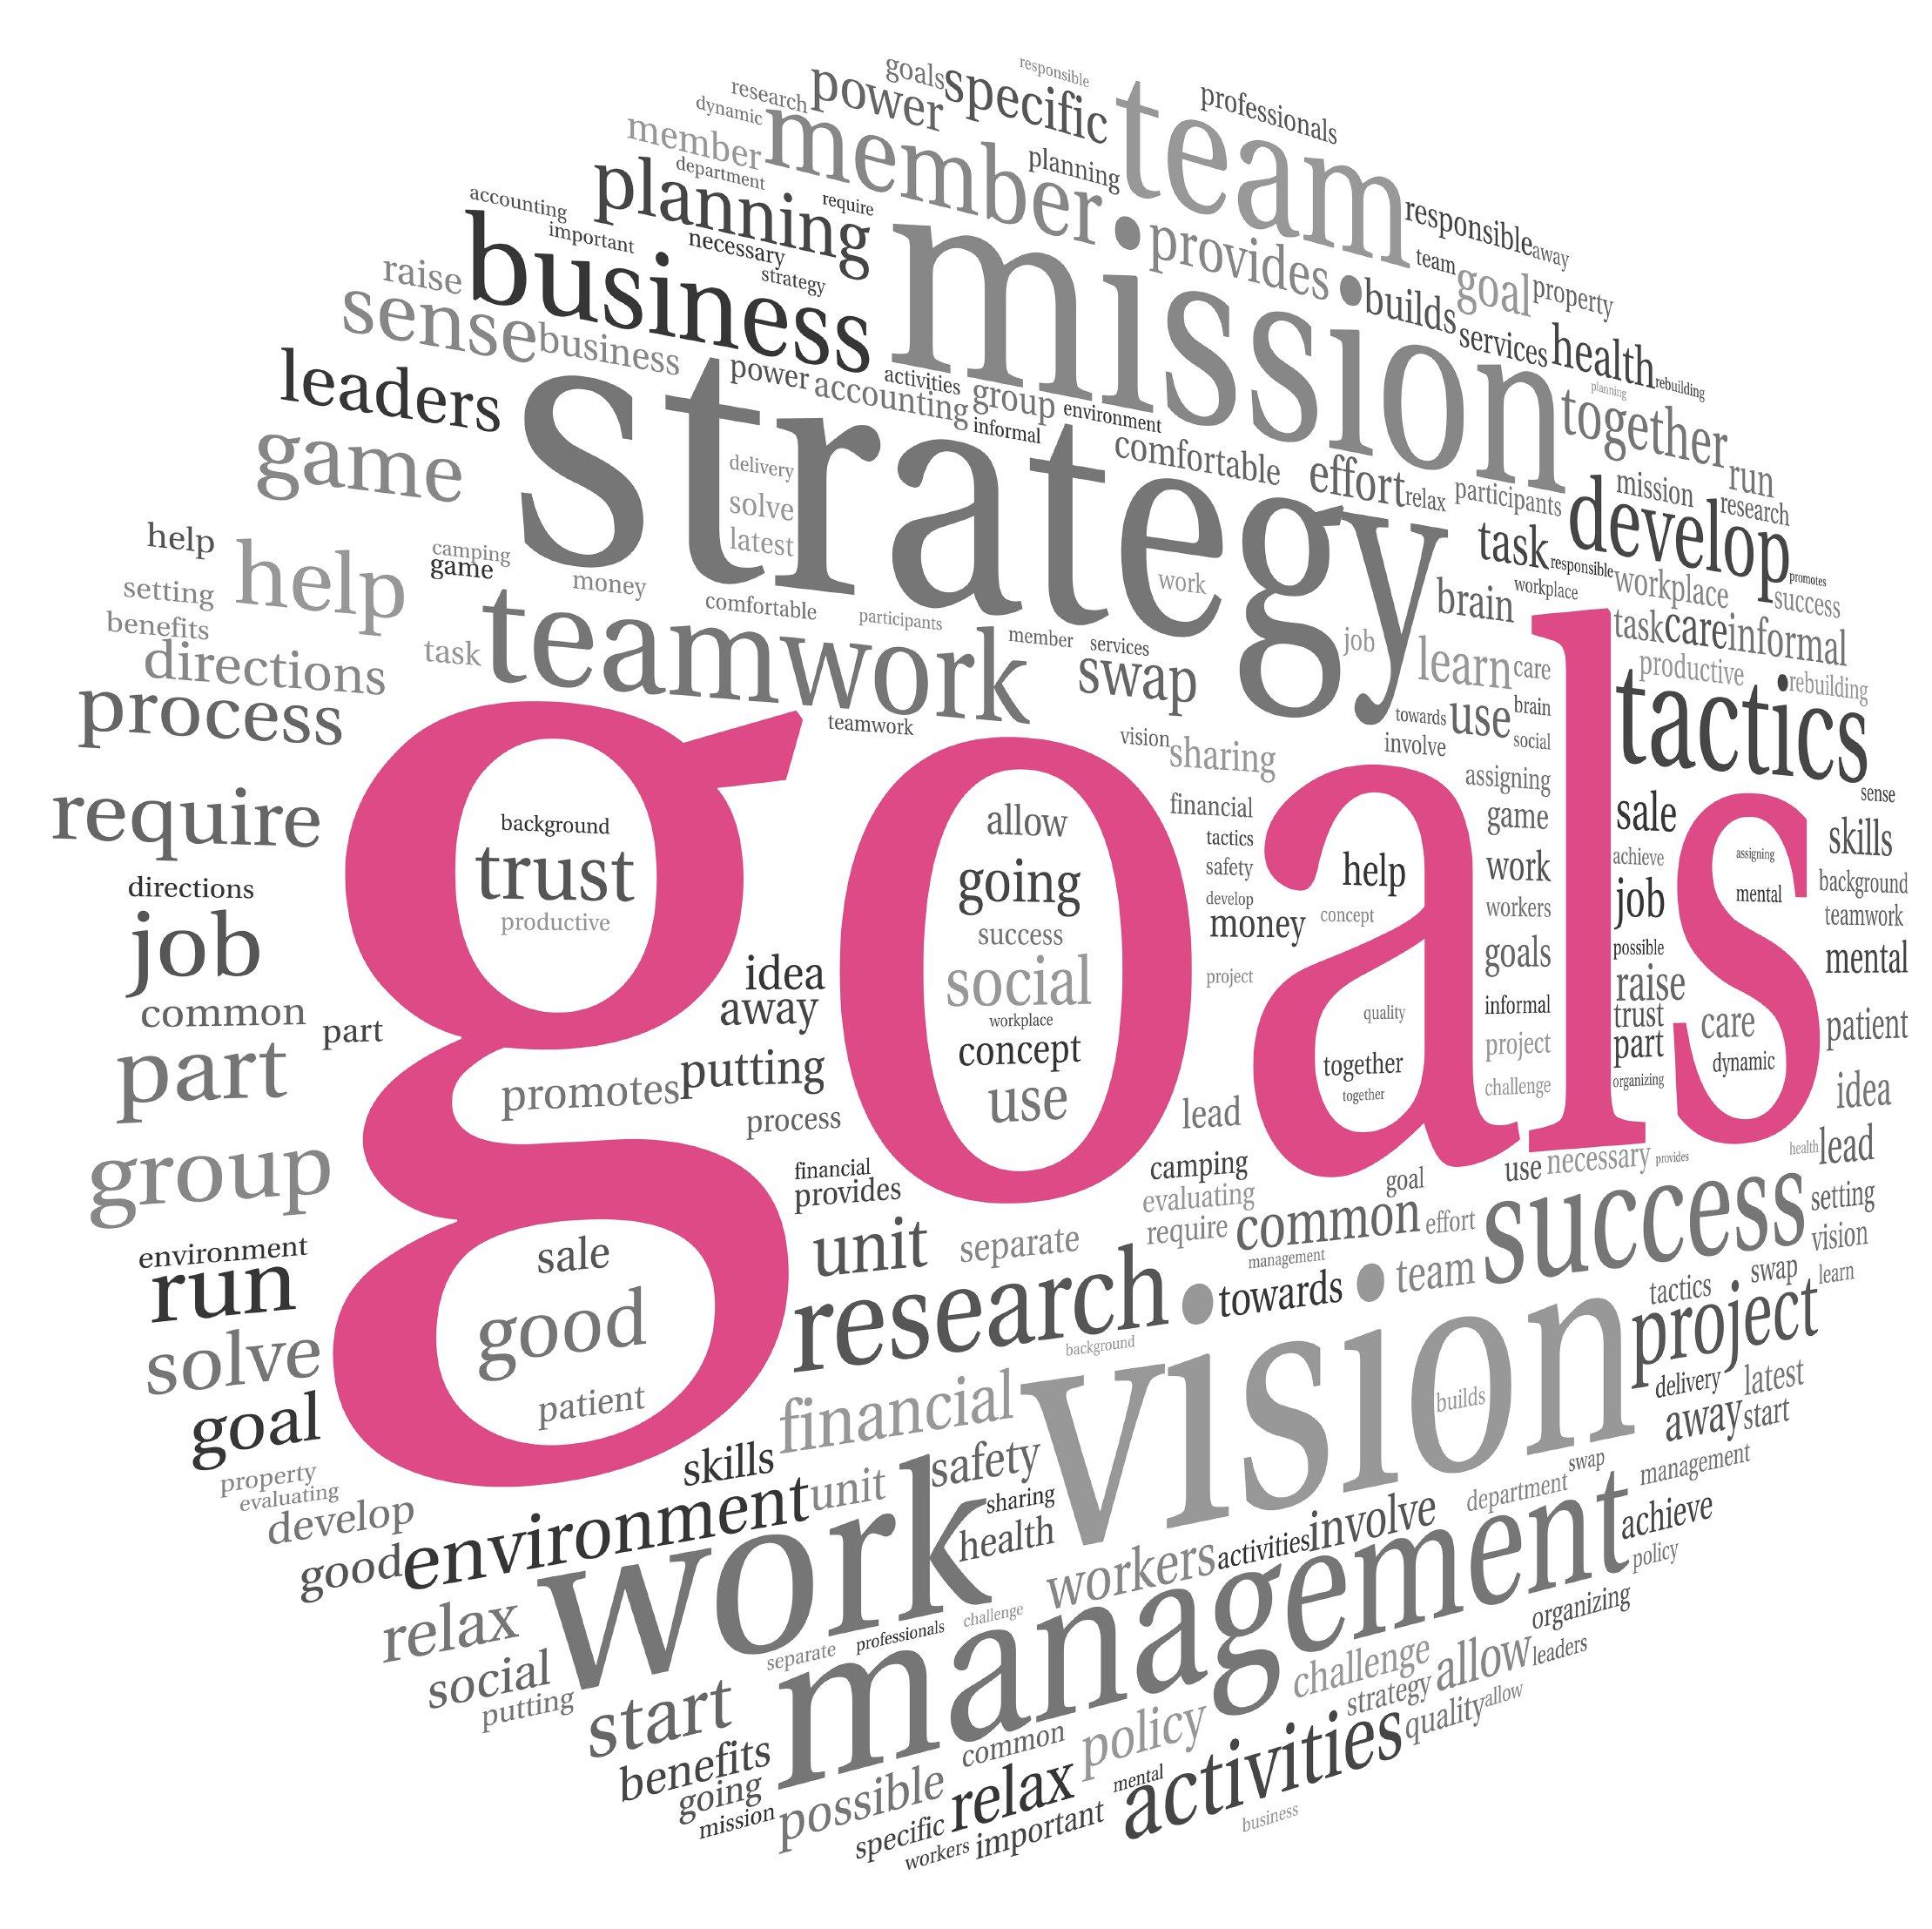 Mind Your Goals 1